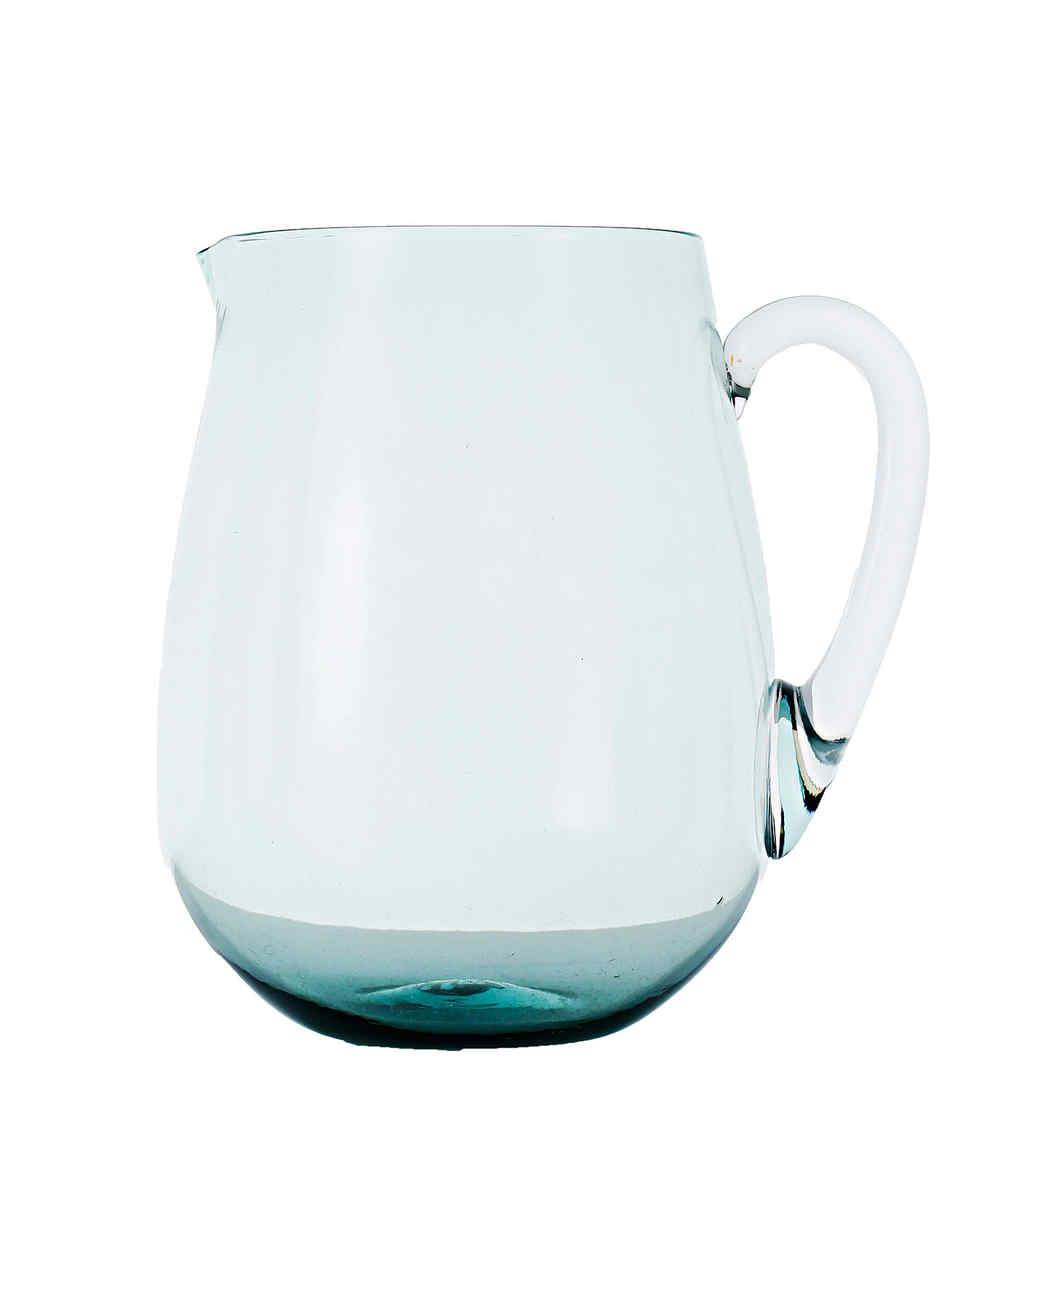 handblown glass pitcher gift guide 2017 home